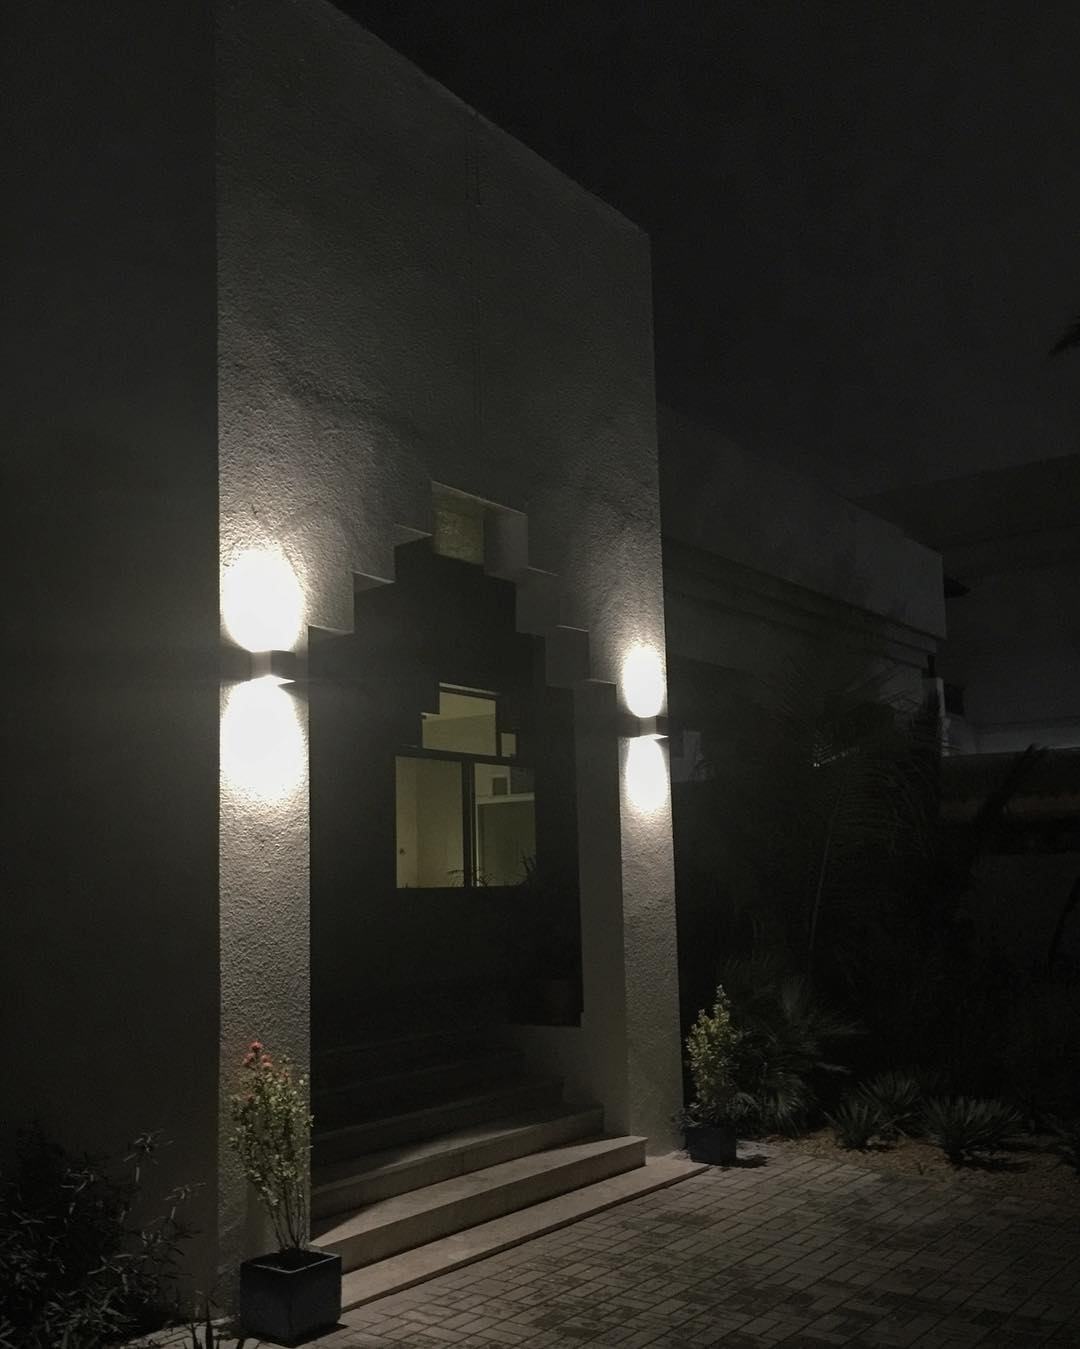 Night view #villadubai #dubaiinteriordesign #residentialproject #ummsuqeim #superfuturedesign